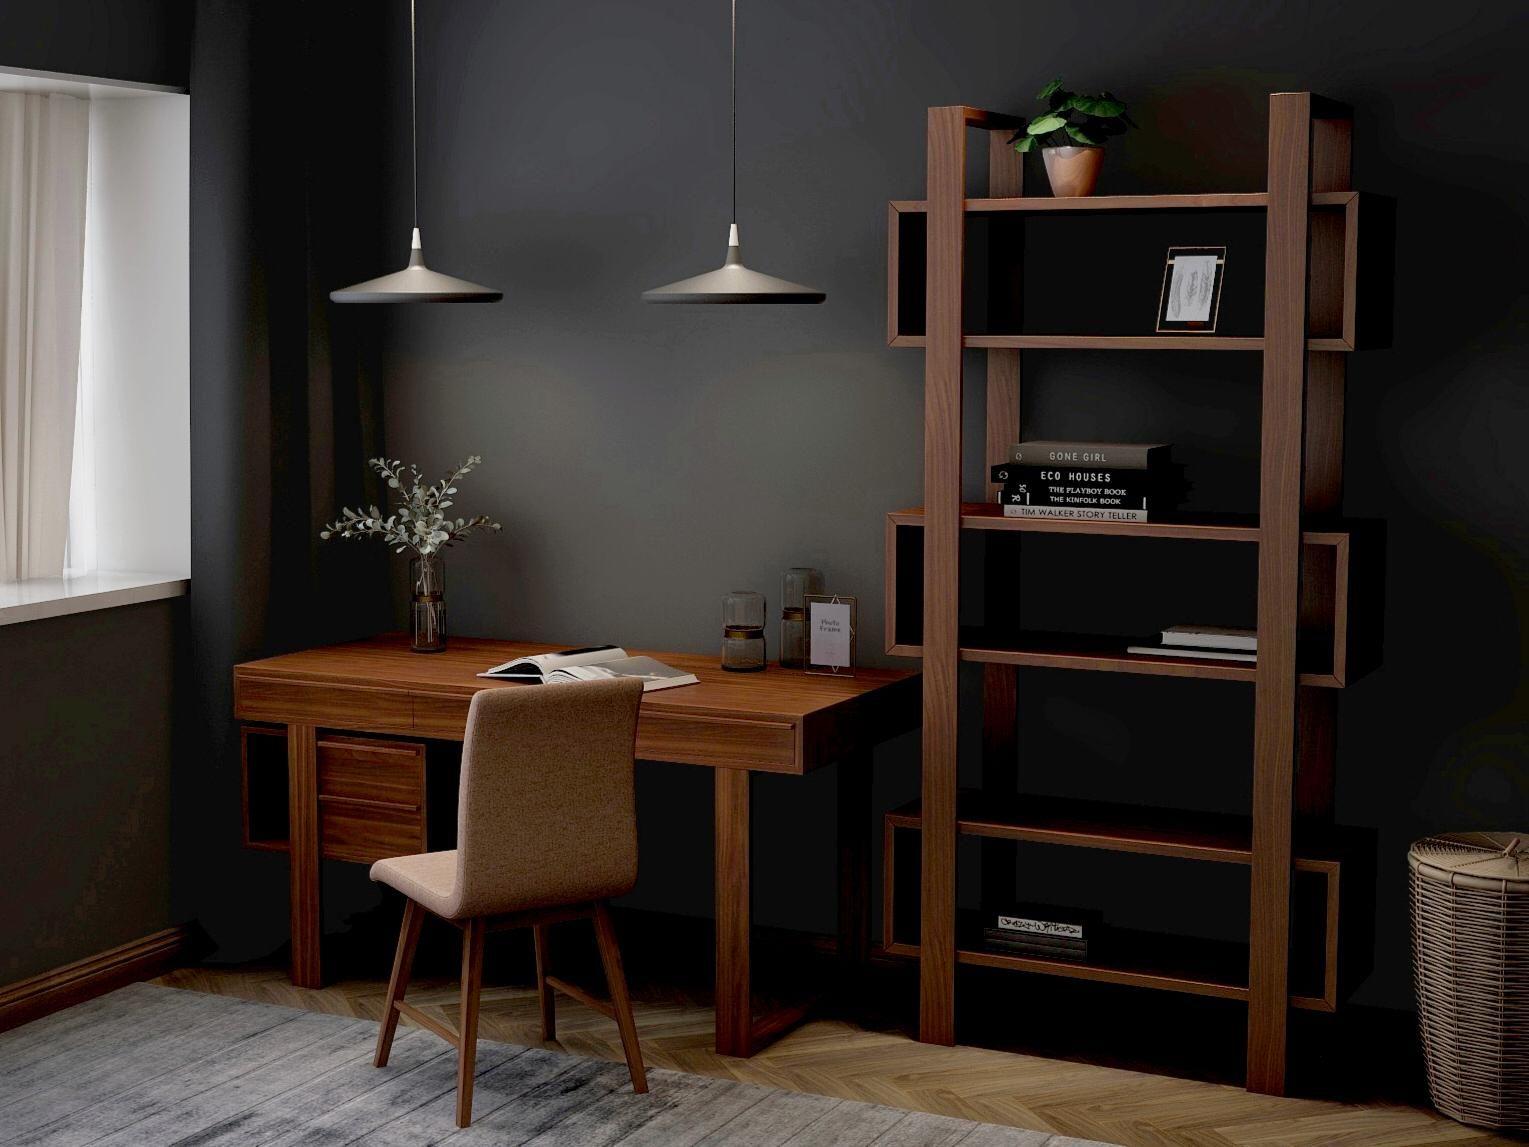 squarerooms-commune-desk-home-office-moody-dark